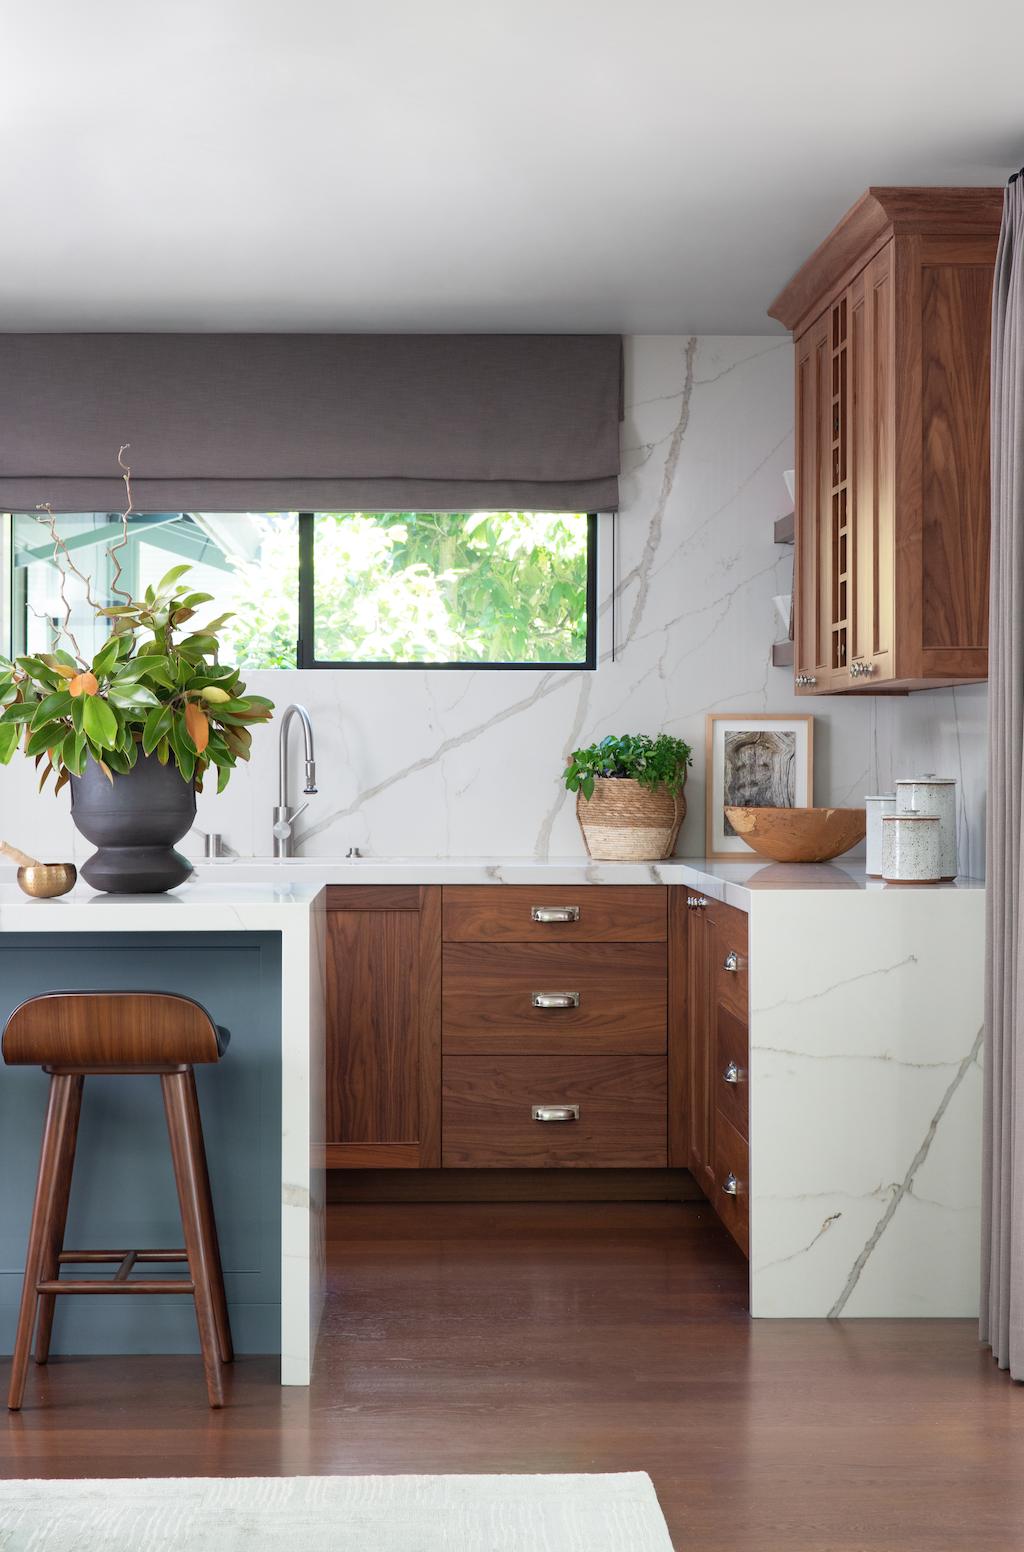 Modern Kitchen Design For A Multi Generational Family Studio Shk Interior Design Firm